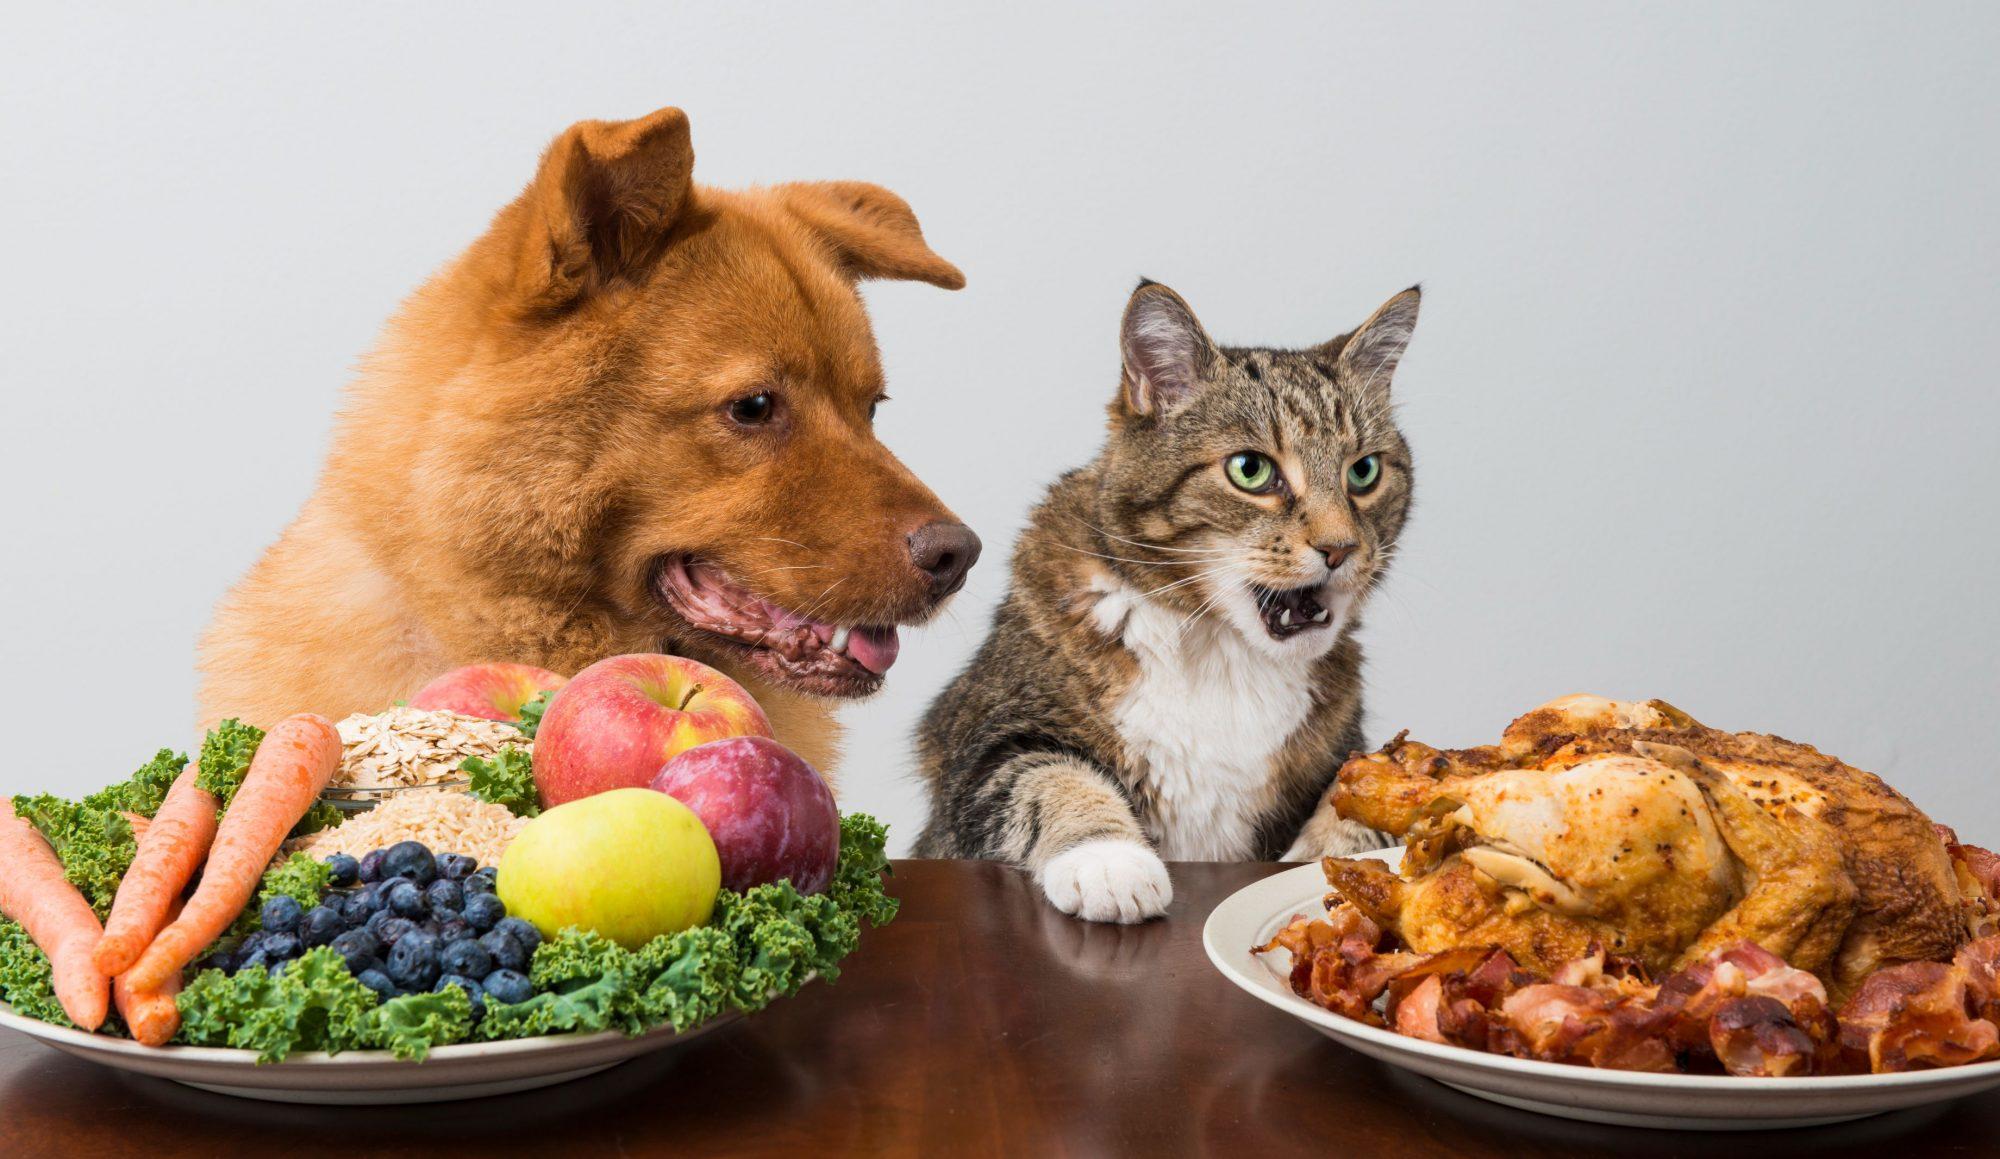 San Antonio cat and dog at holiday meal.